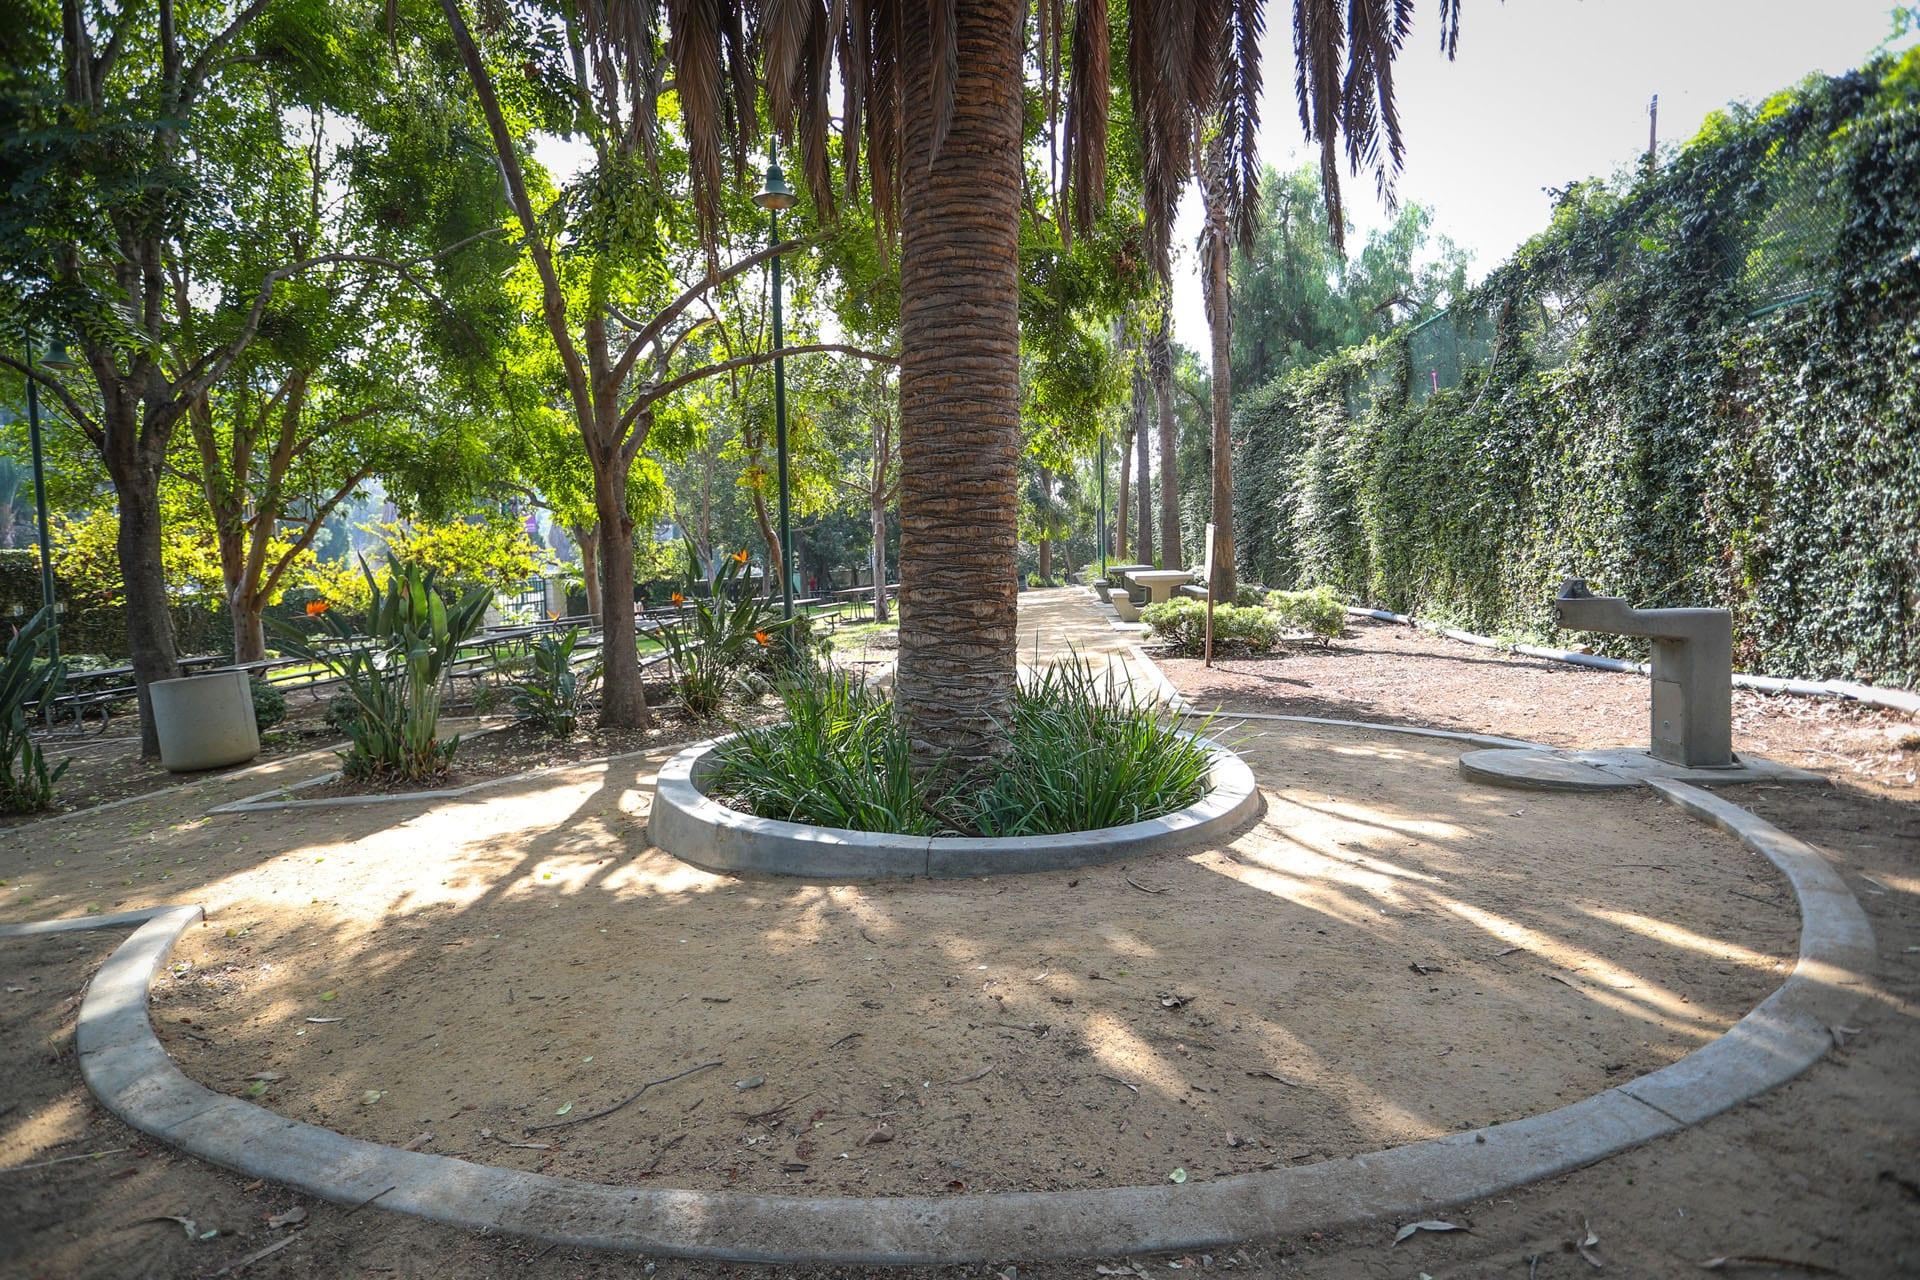 Dirt path through a garden with palm trees